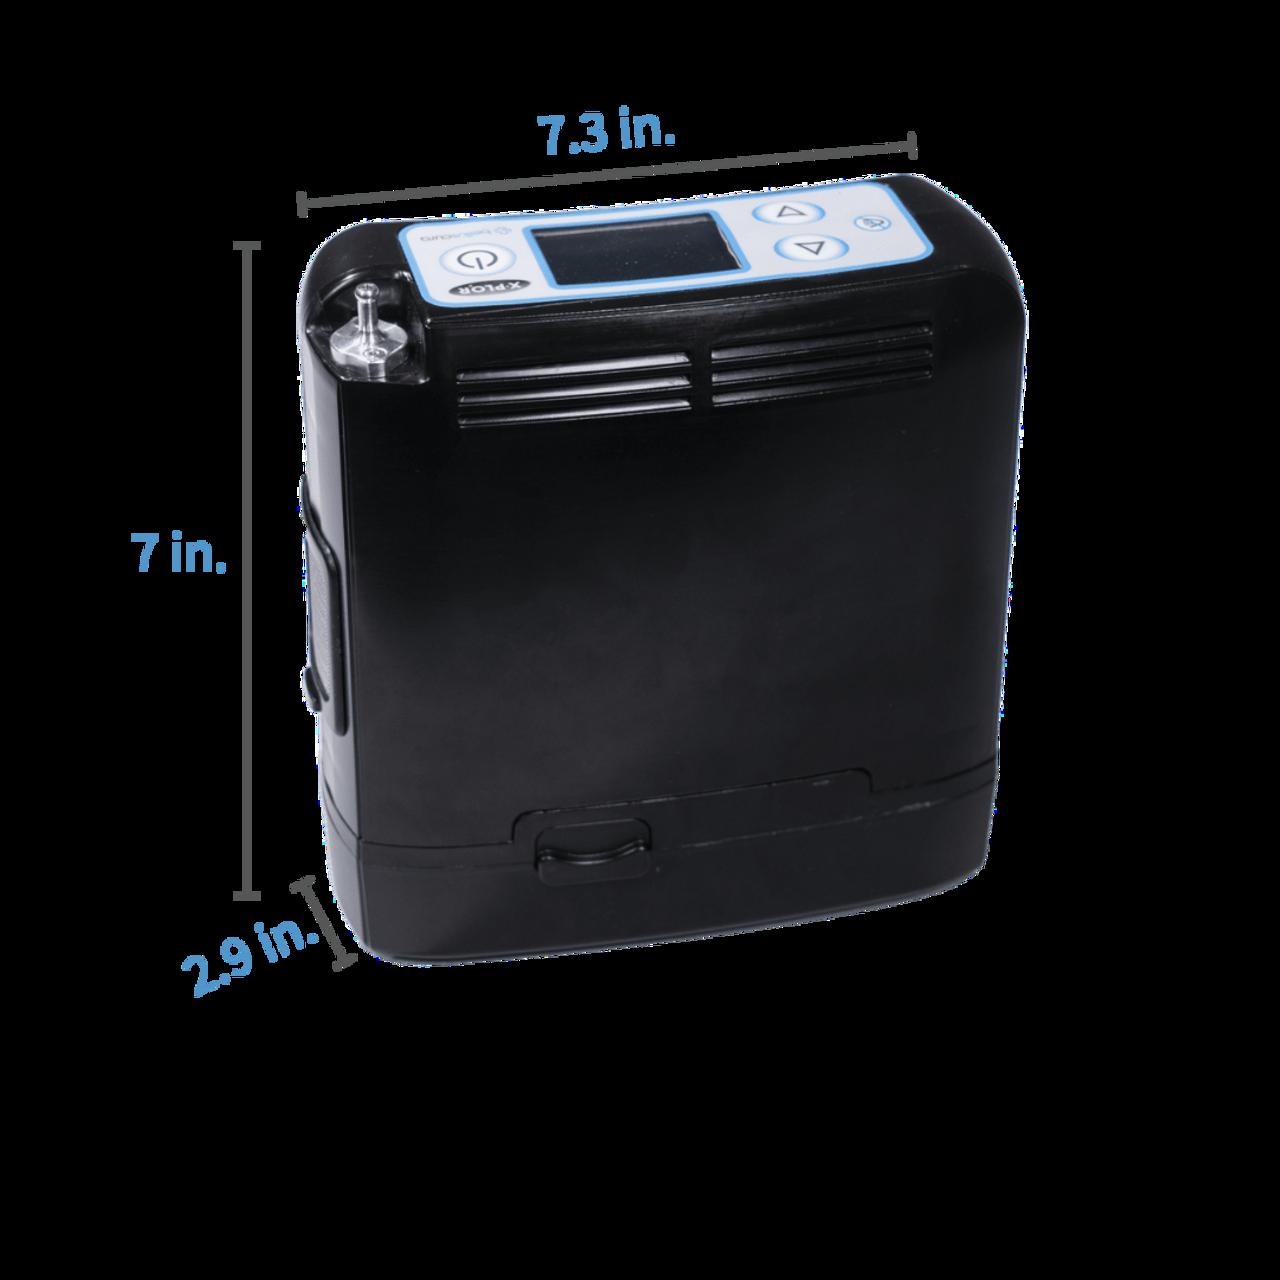 Belluscura X-PLO2R Portable Oxygen Concentrator